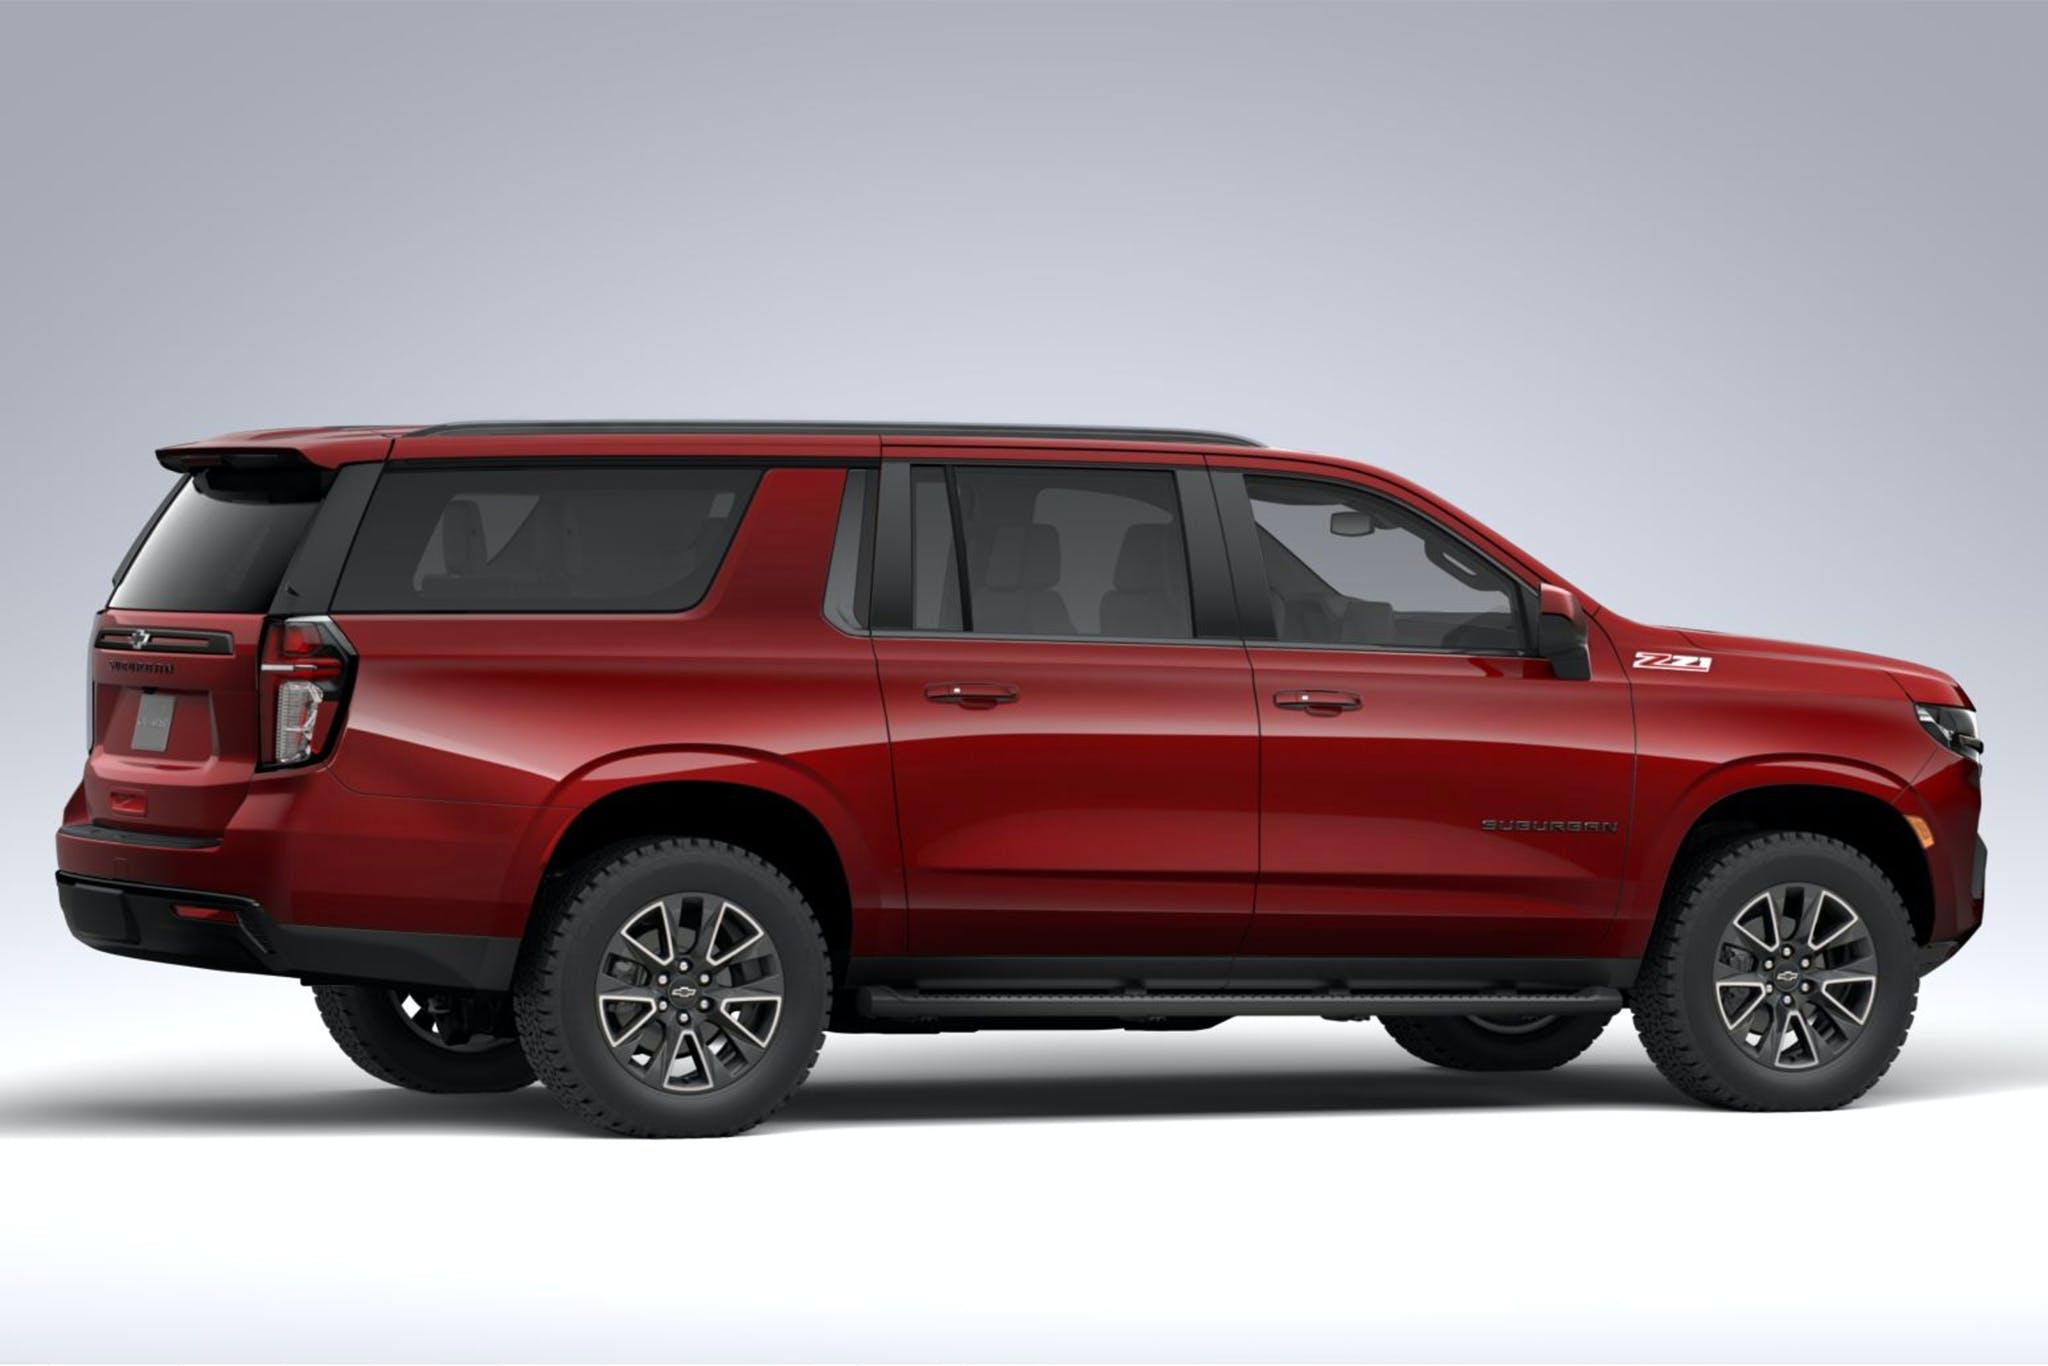 Chevrolet-Suburban-Z71-7